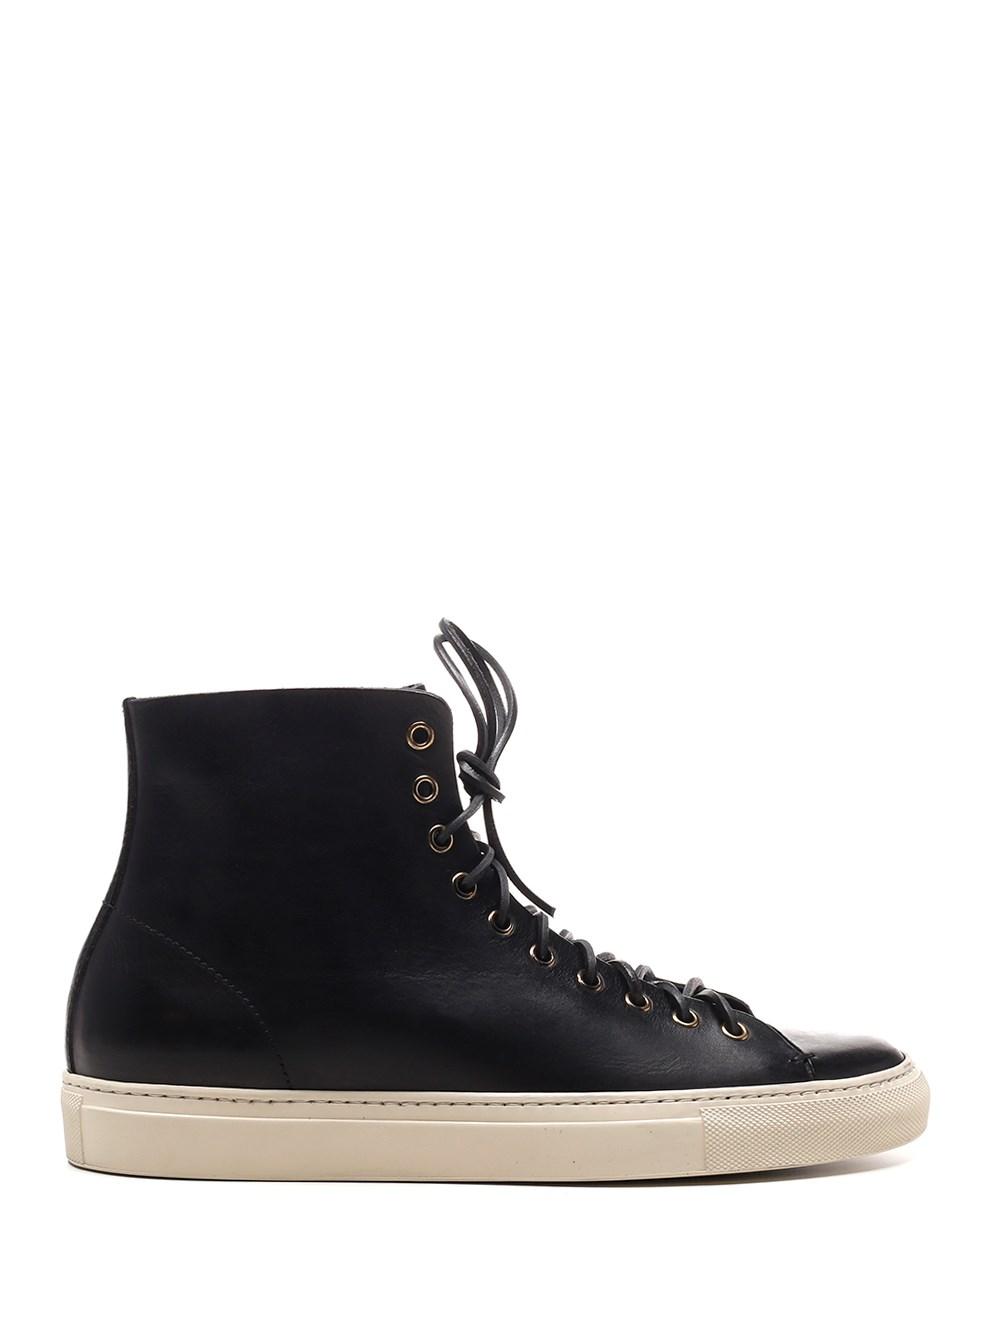 "BUTTERO ""Tanino"" High-Top Sneakers"